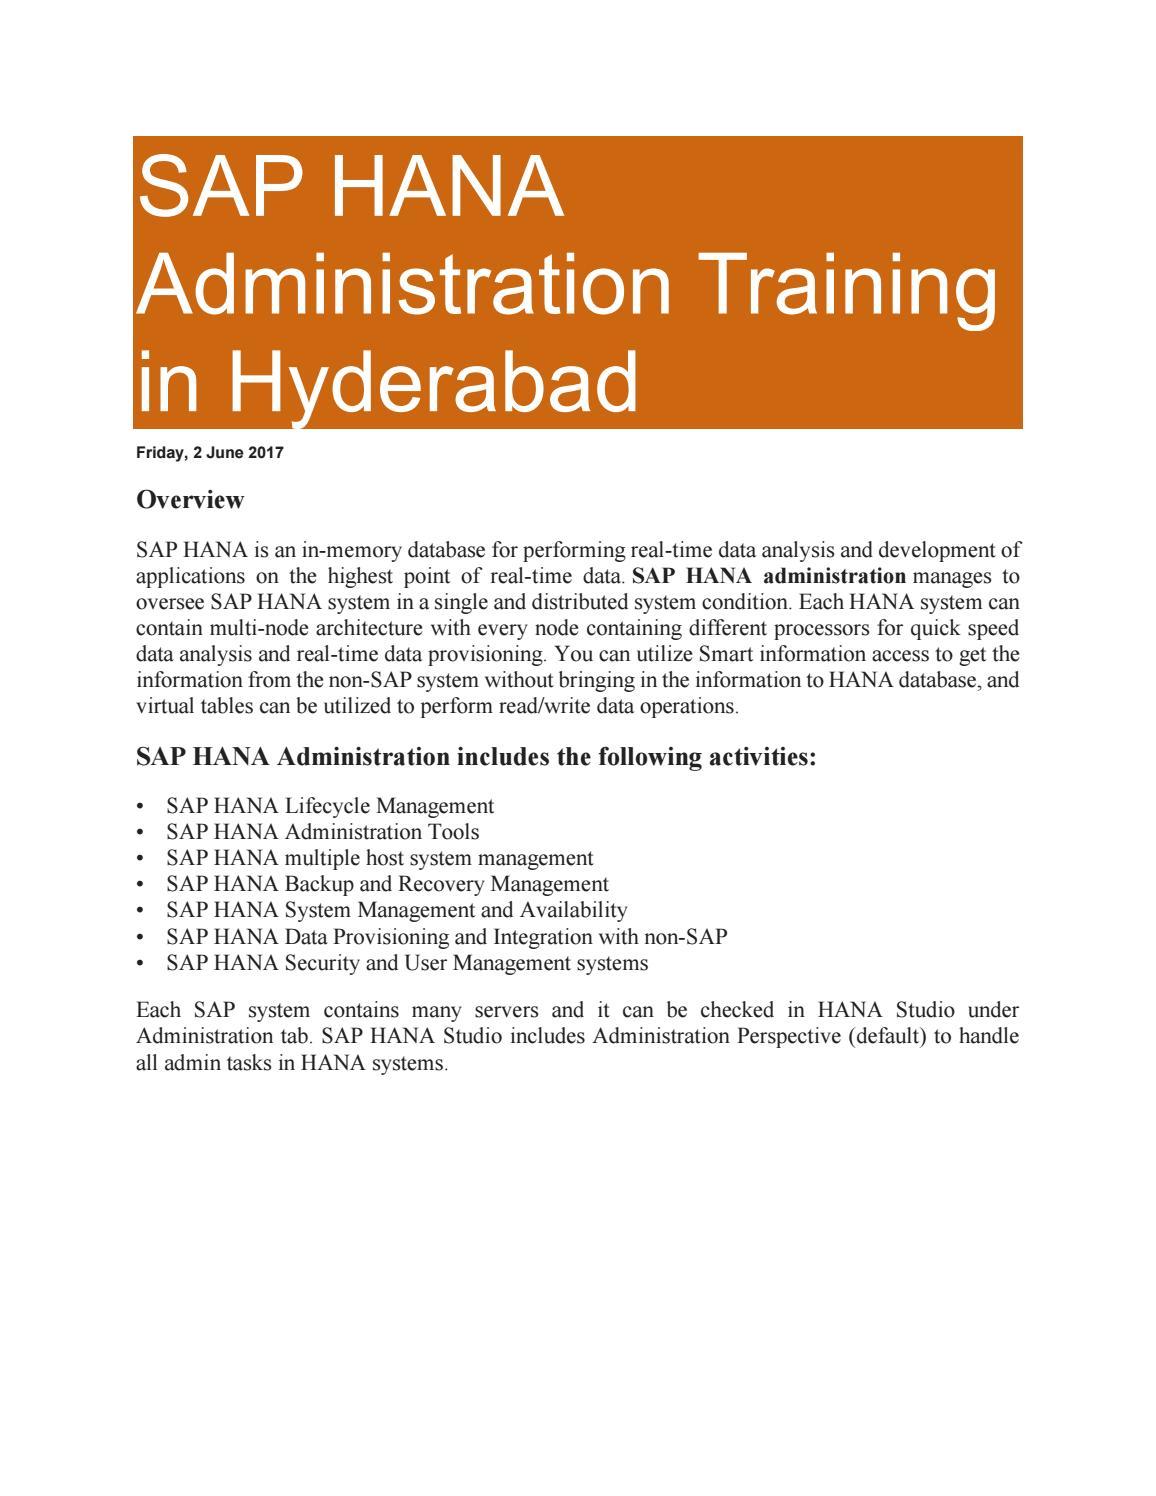 SAP HANA Training Material | SAP HANA Admin pdf by arpana allentics